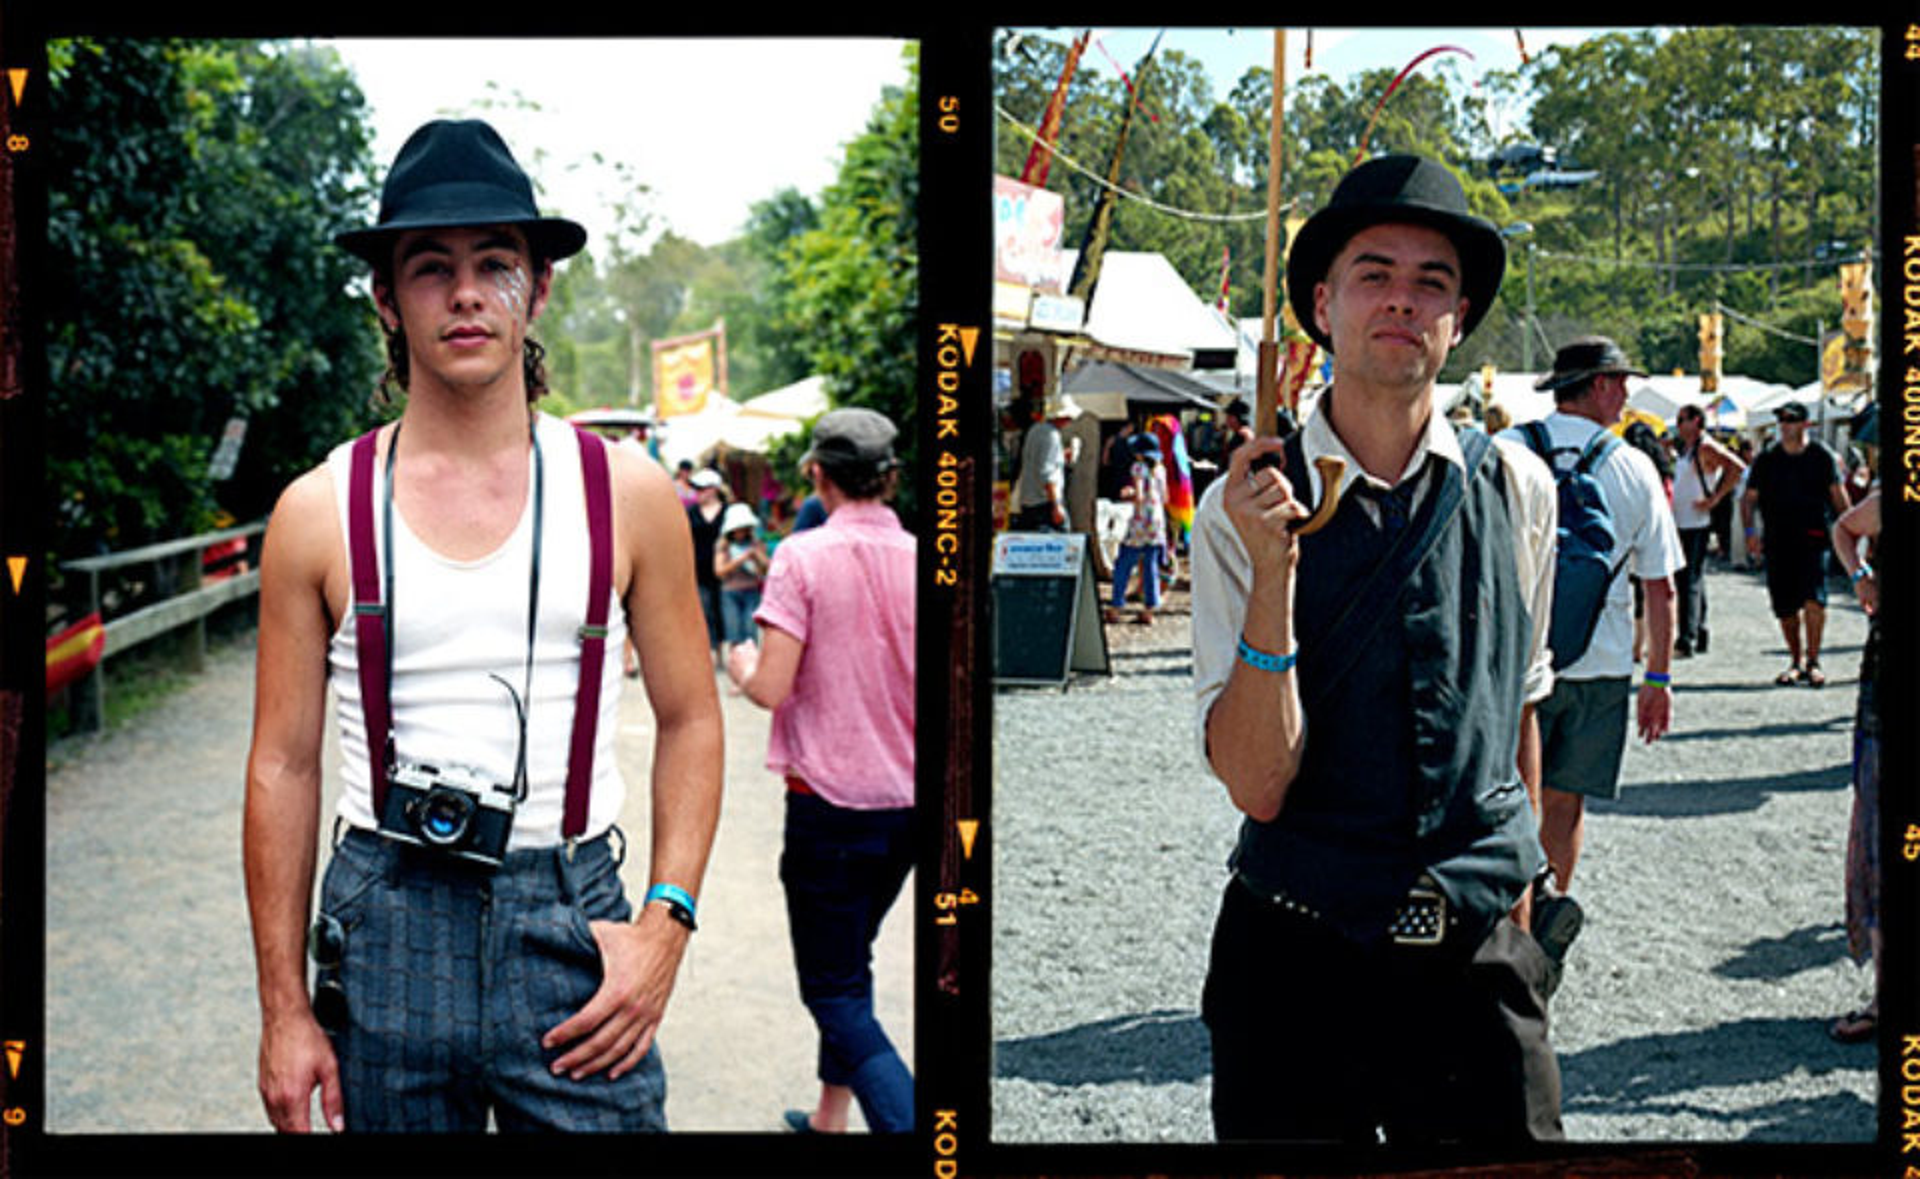 Woodford folk festival 05